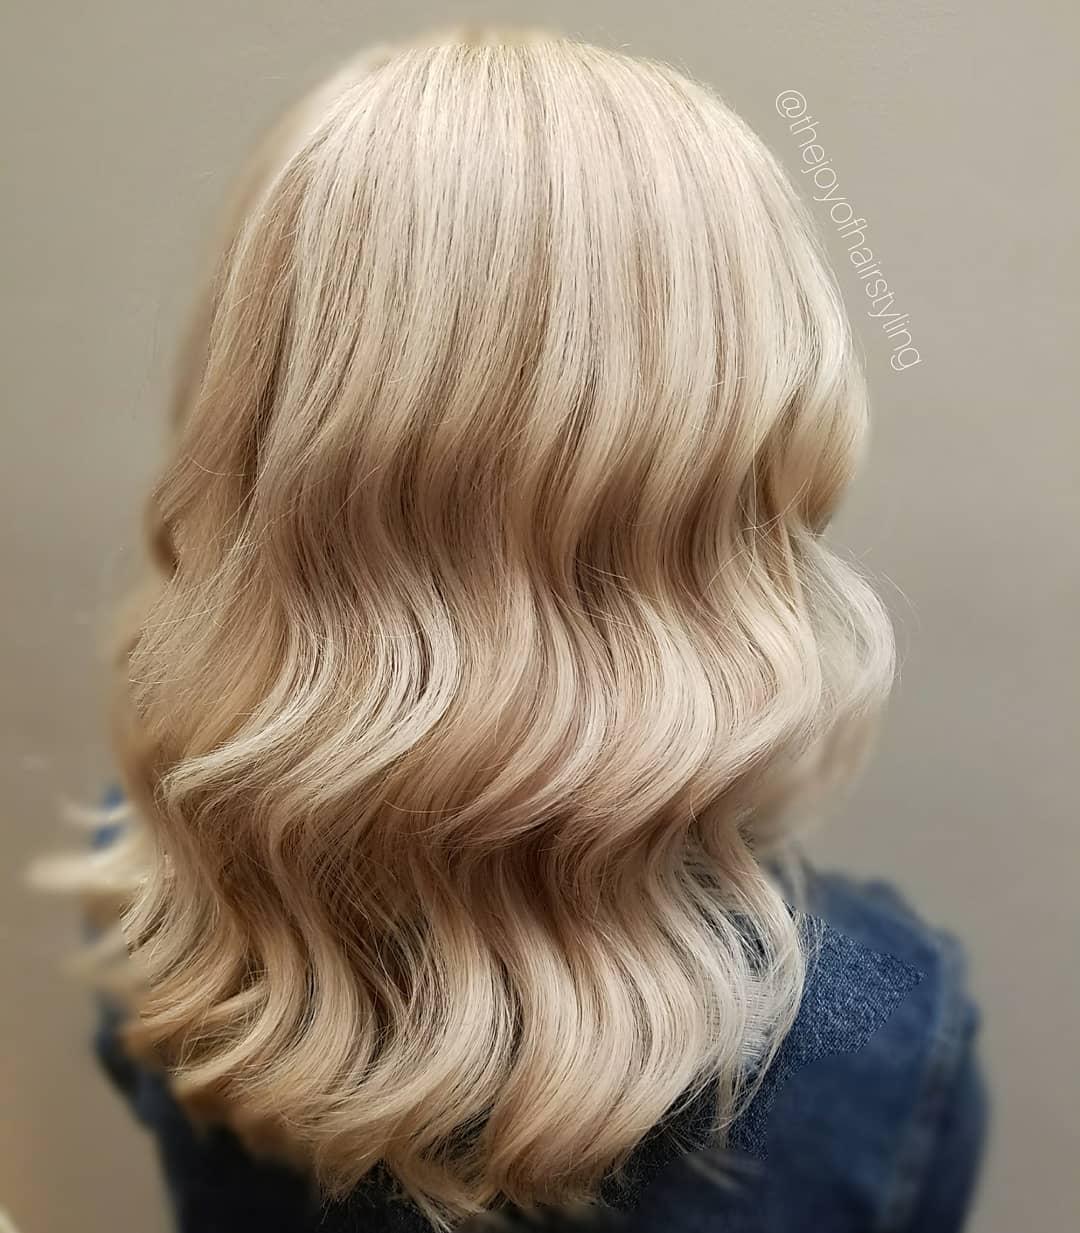 Vanilla blonde hair with lowlights added